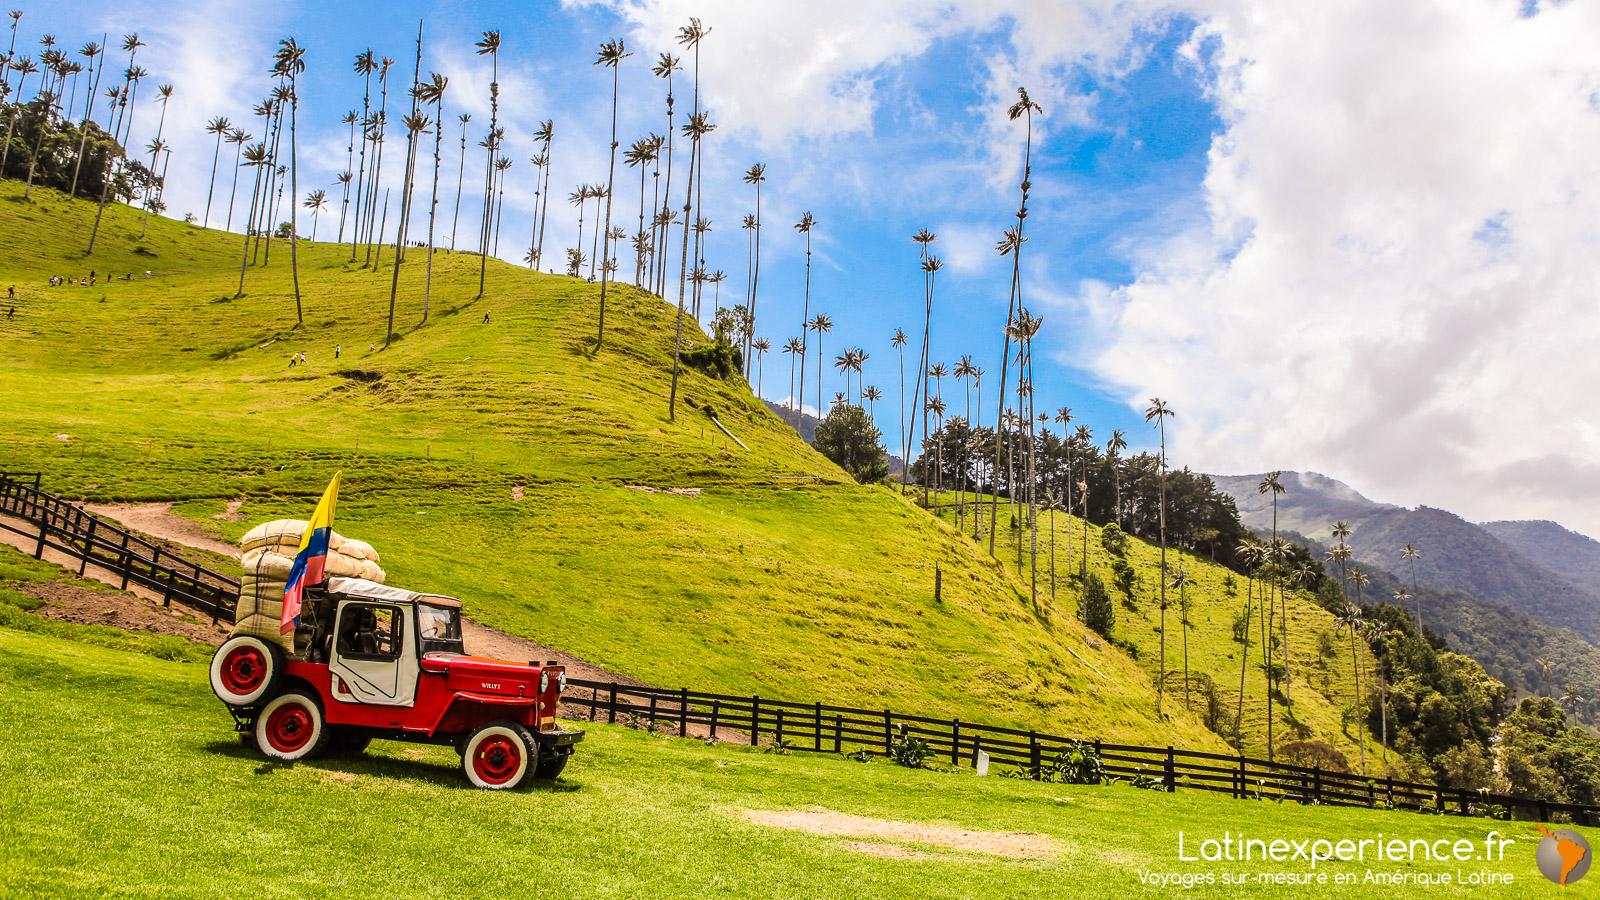 Colombie - Vallée de Cocora - Latinexperience voyages